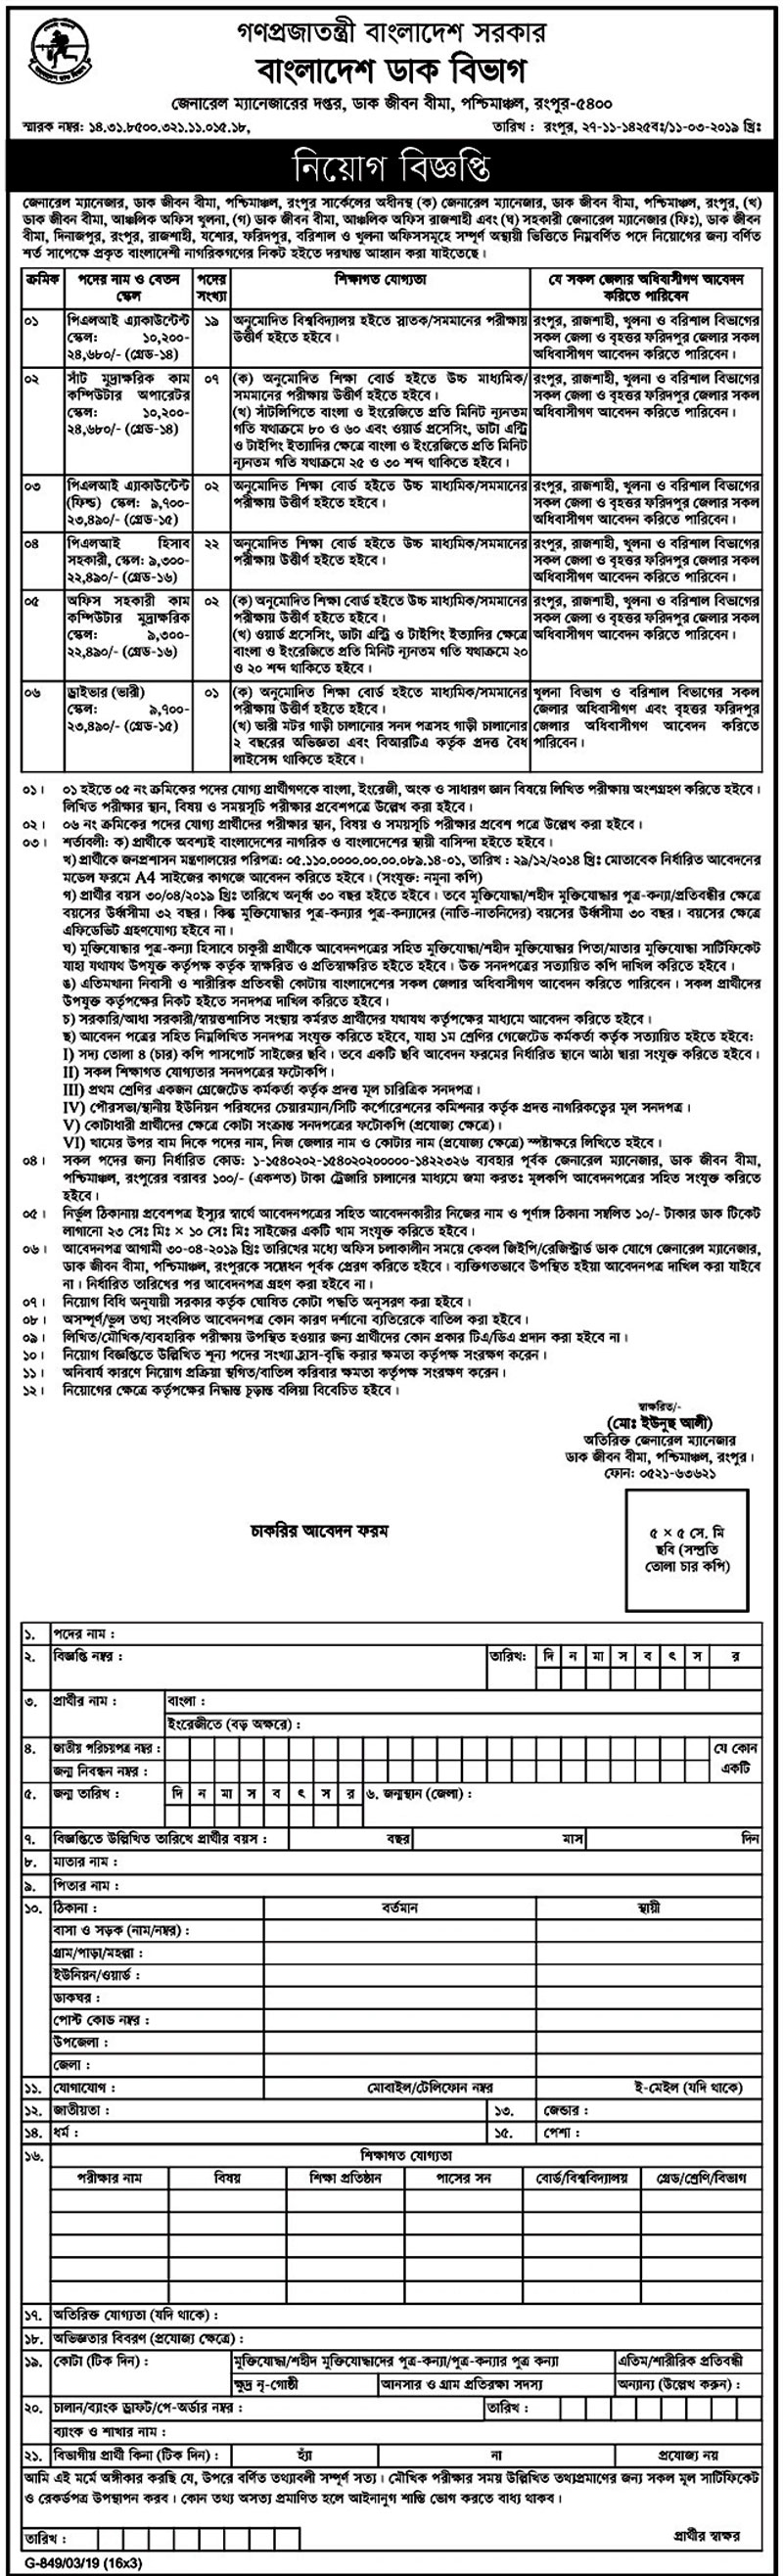 Post Office Job 2019,Govt job Post Office Job 2019